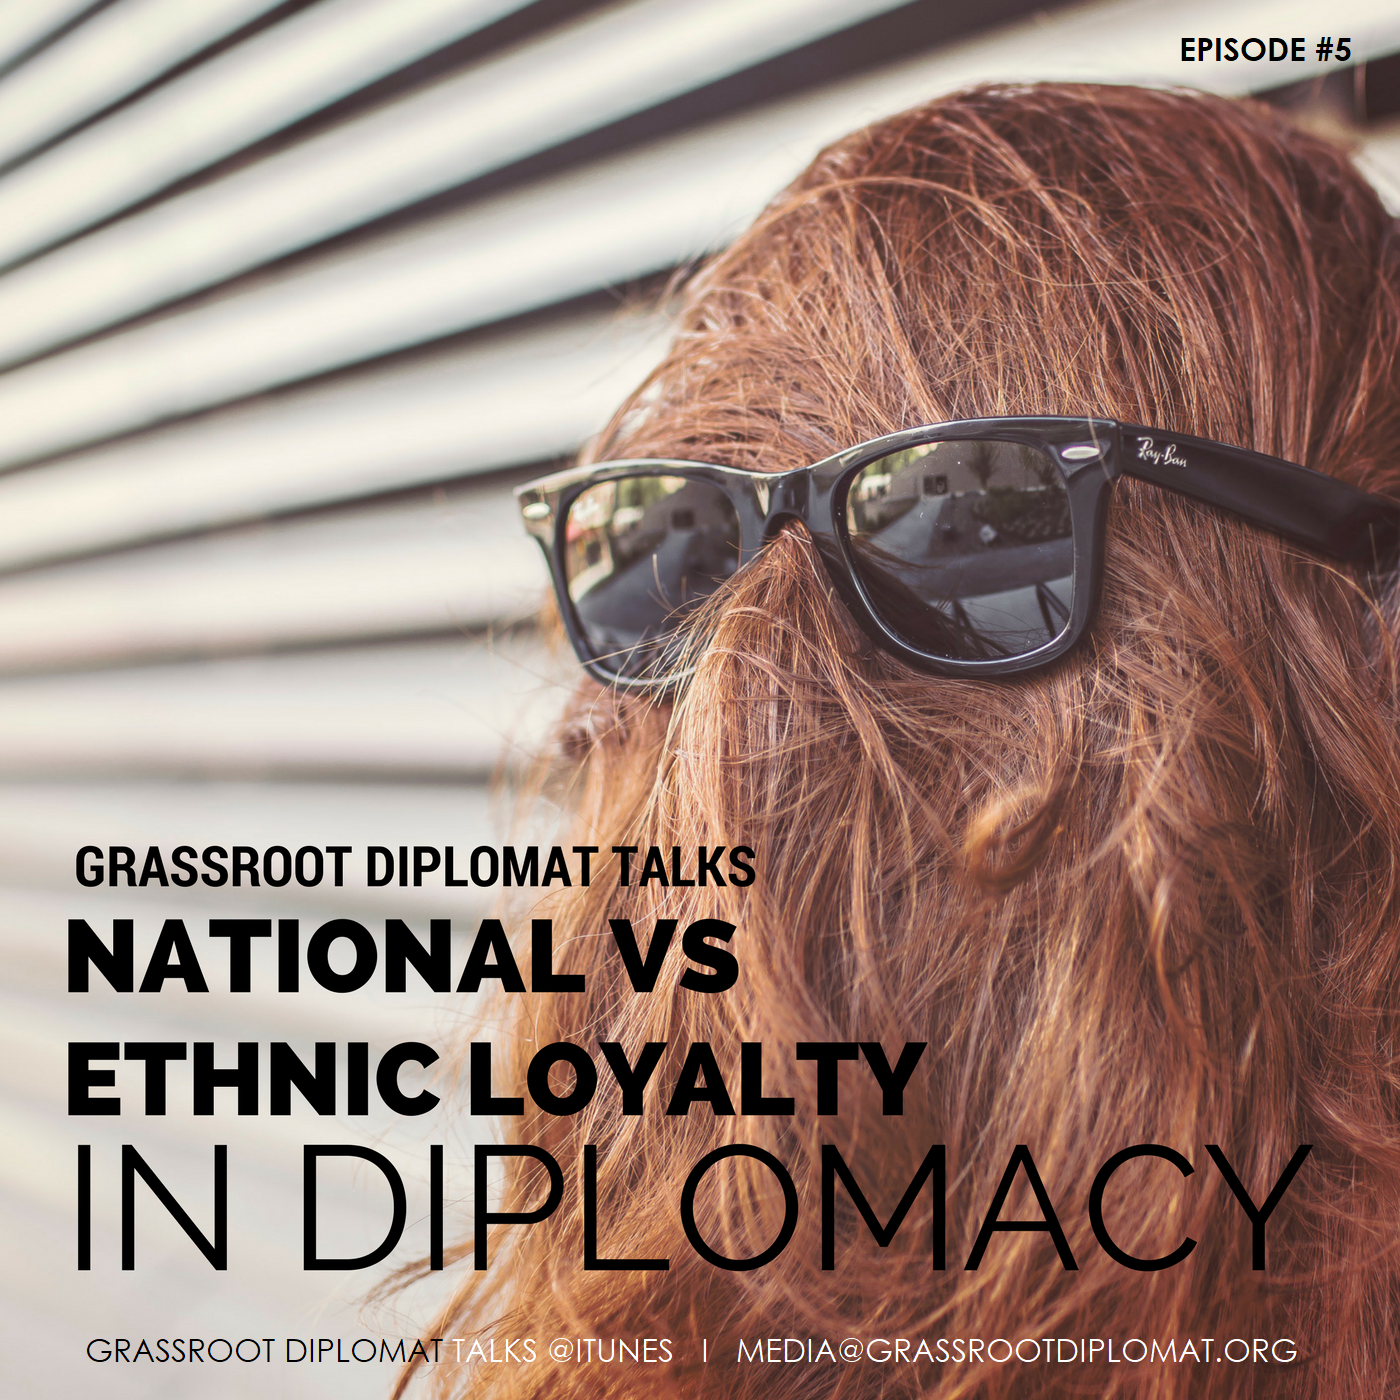 005 National versus Ethnic Loyalty in Diplomacy.png